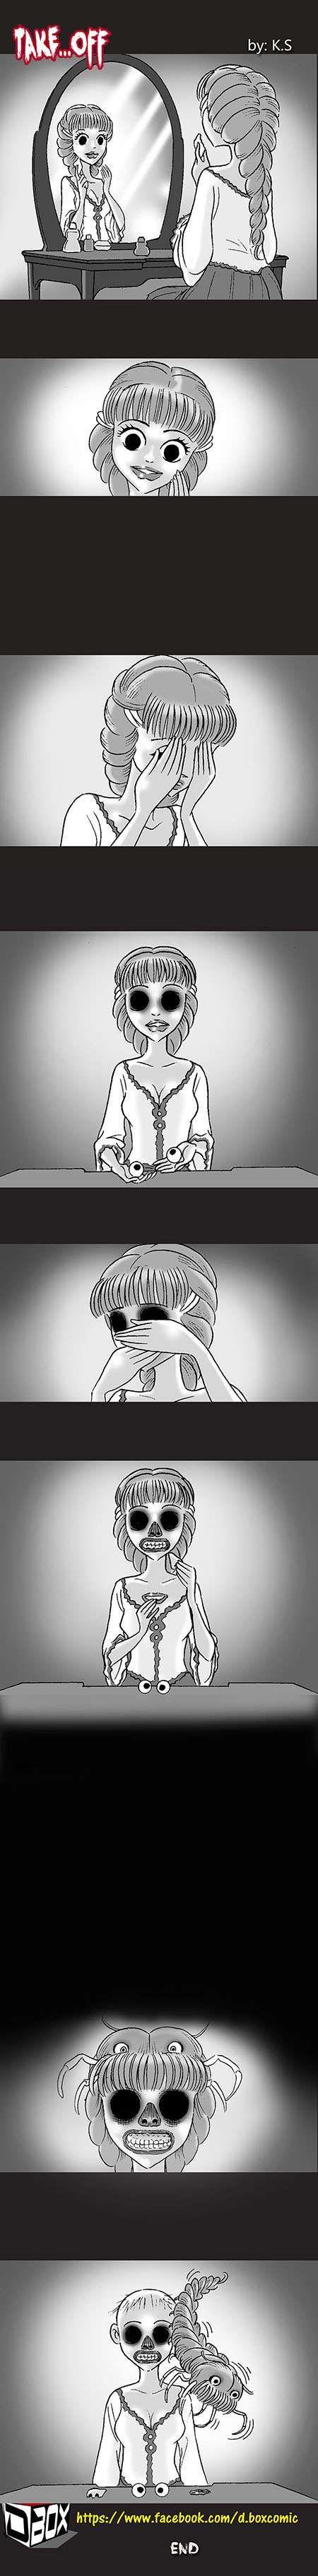 Silent Horror :: Take...Off | Tapastic Comics - image 1